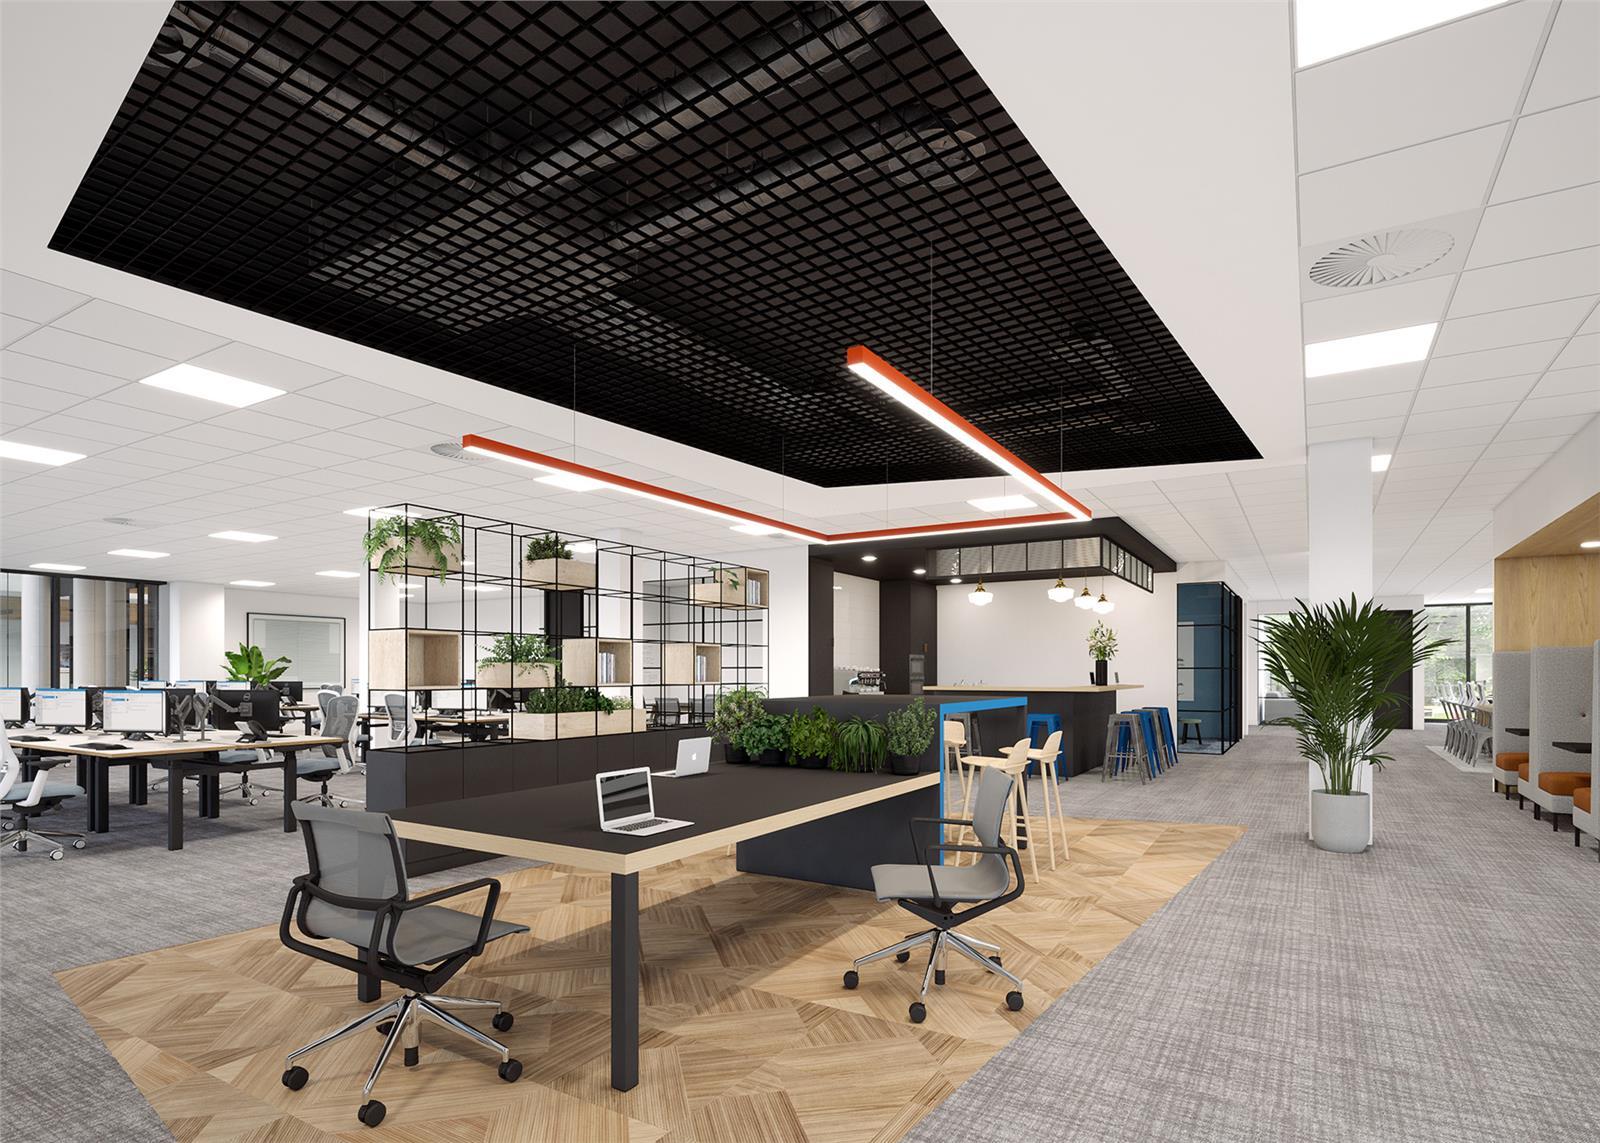 1600 Arlington Business Park, Reading, Berkshire, RG7